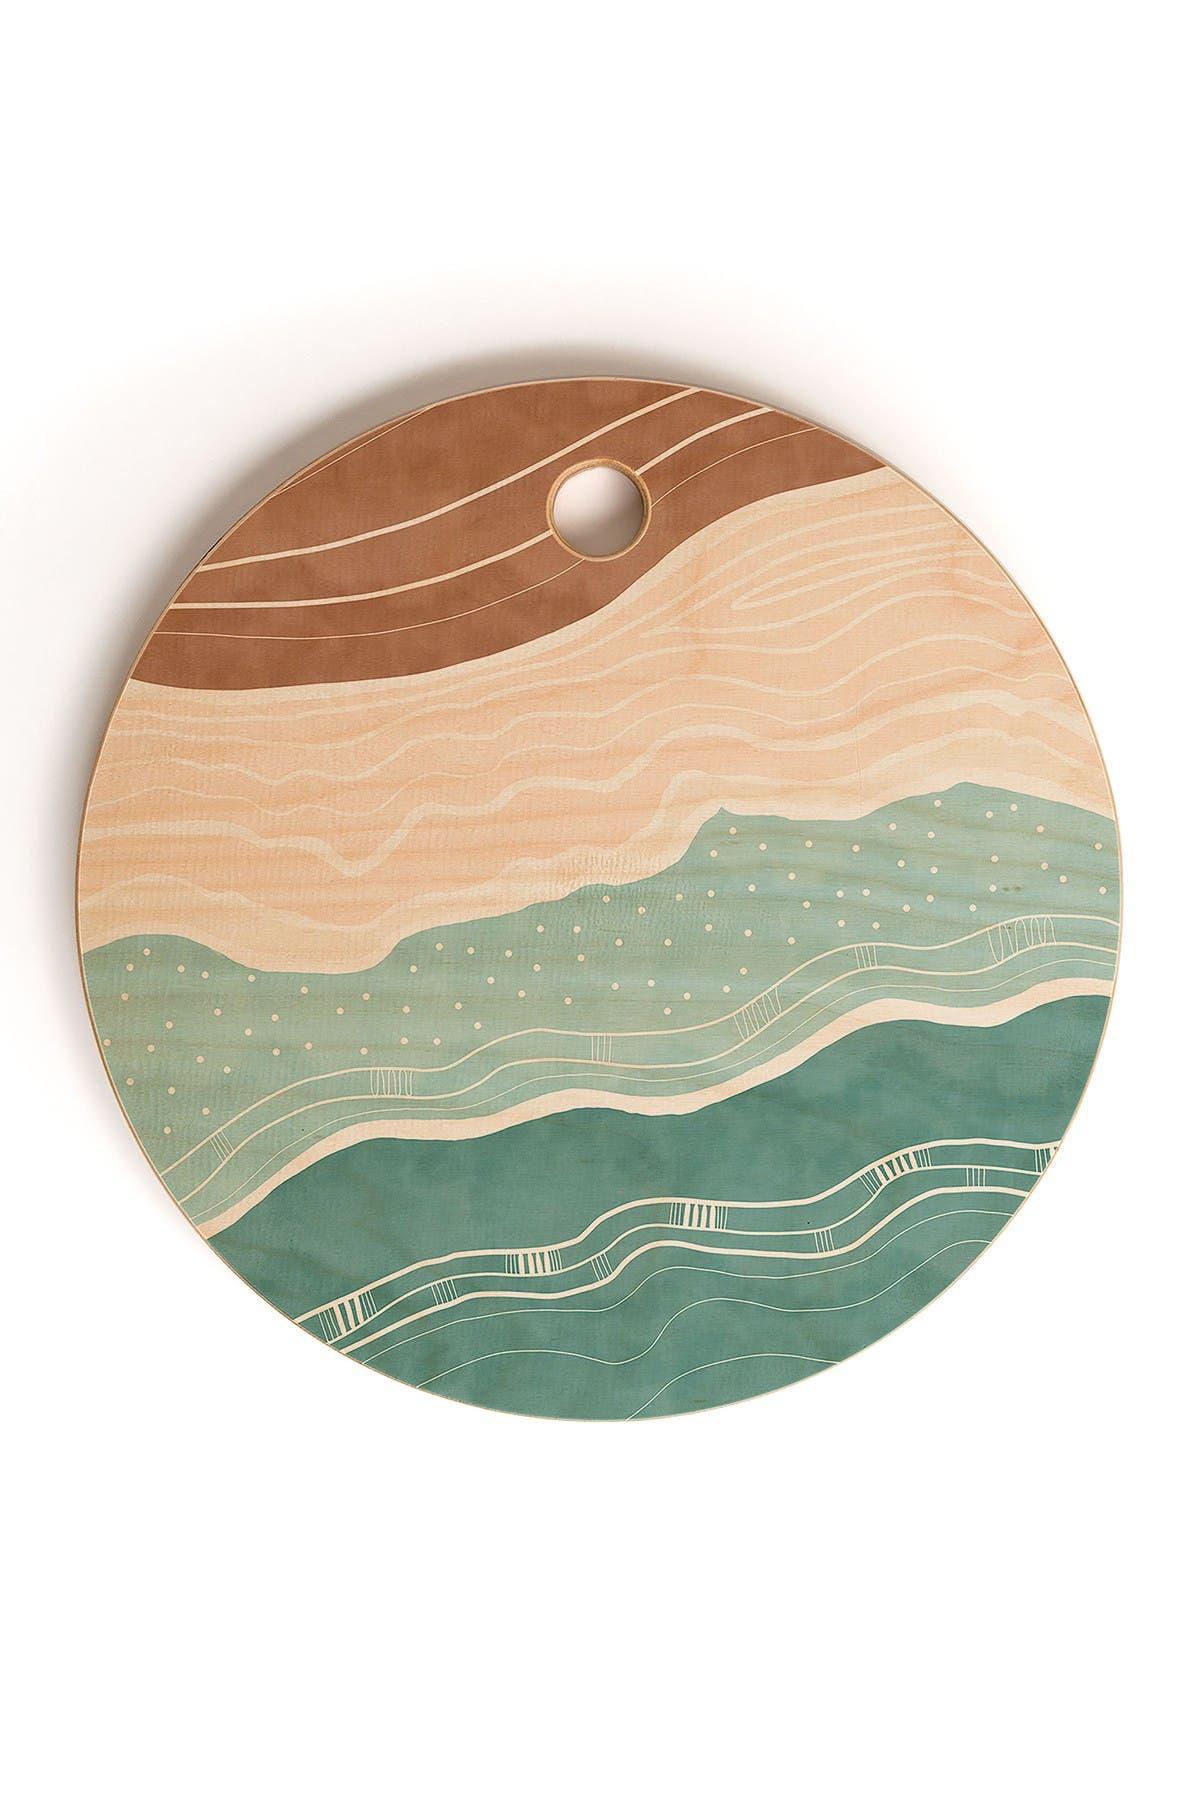 Image of Deny Designs Marta Barragan Camarasa Modern beach abstract II Round Cutting Board